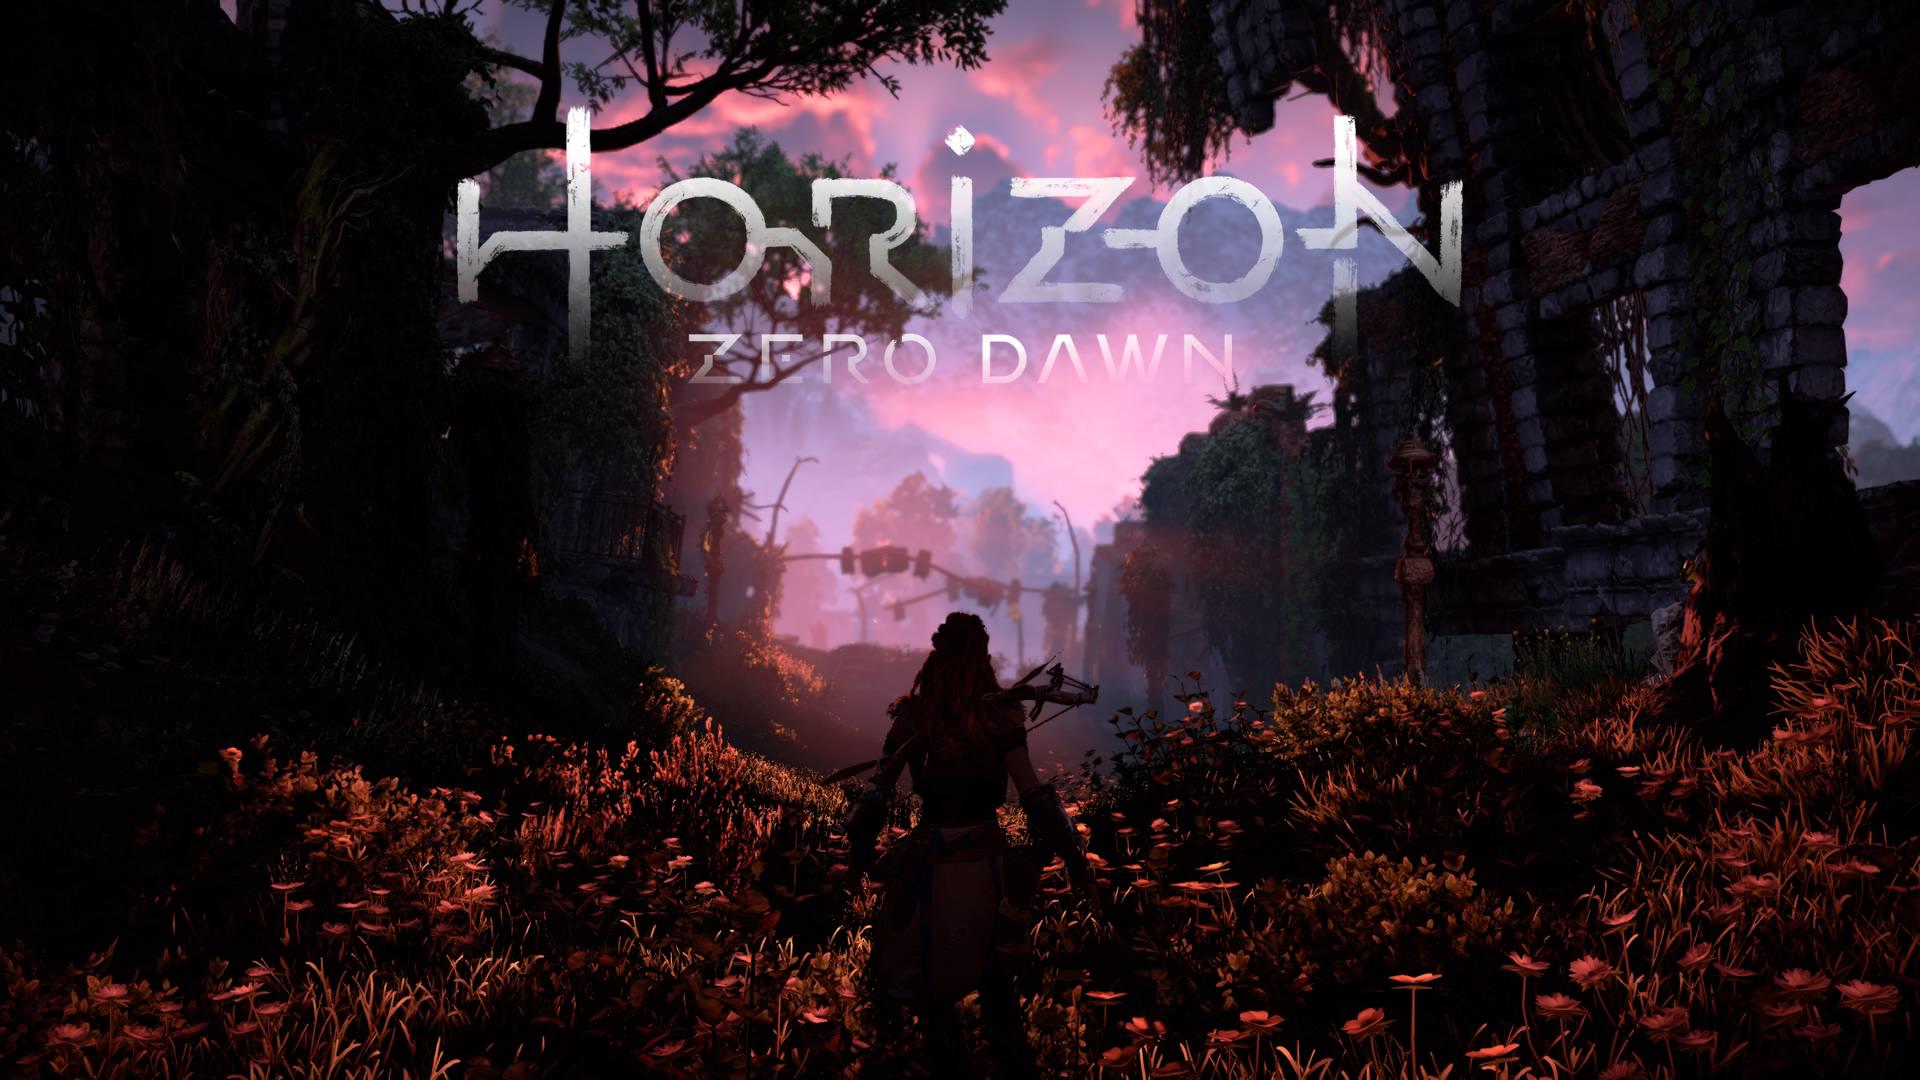 Project Zero Dawn Icons By Xelku9 Db2vifl Png 684 684 Horizon Zero Dawn Horizon Zero Dawn Aloy Dawn